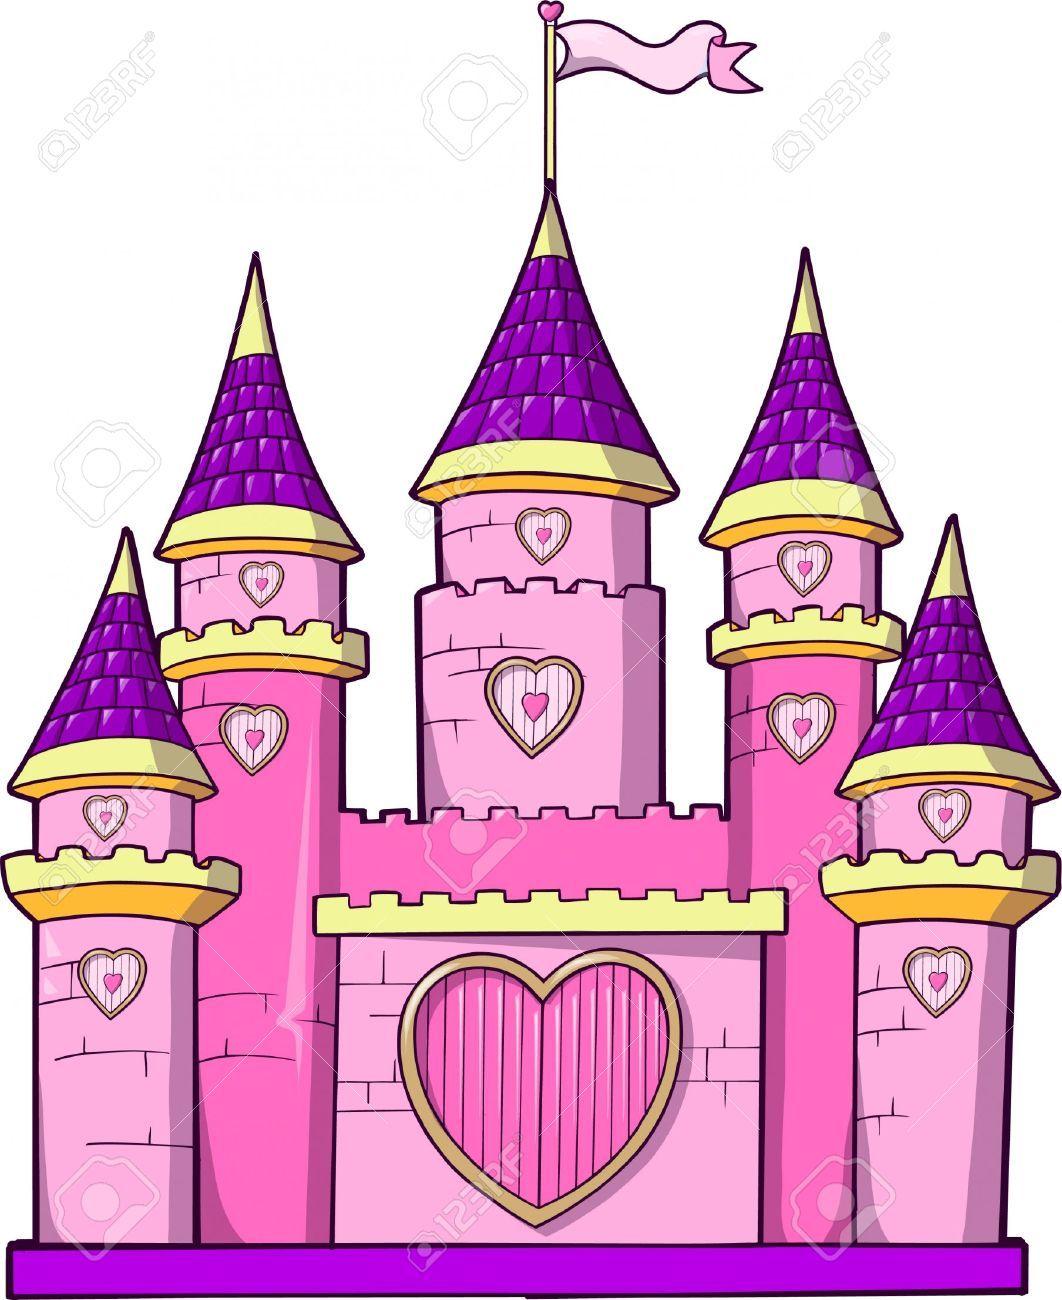 Clipart castle princess sofia. Pictures google search cards